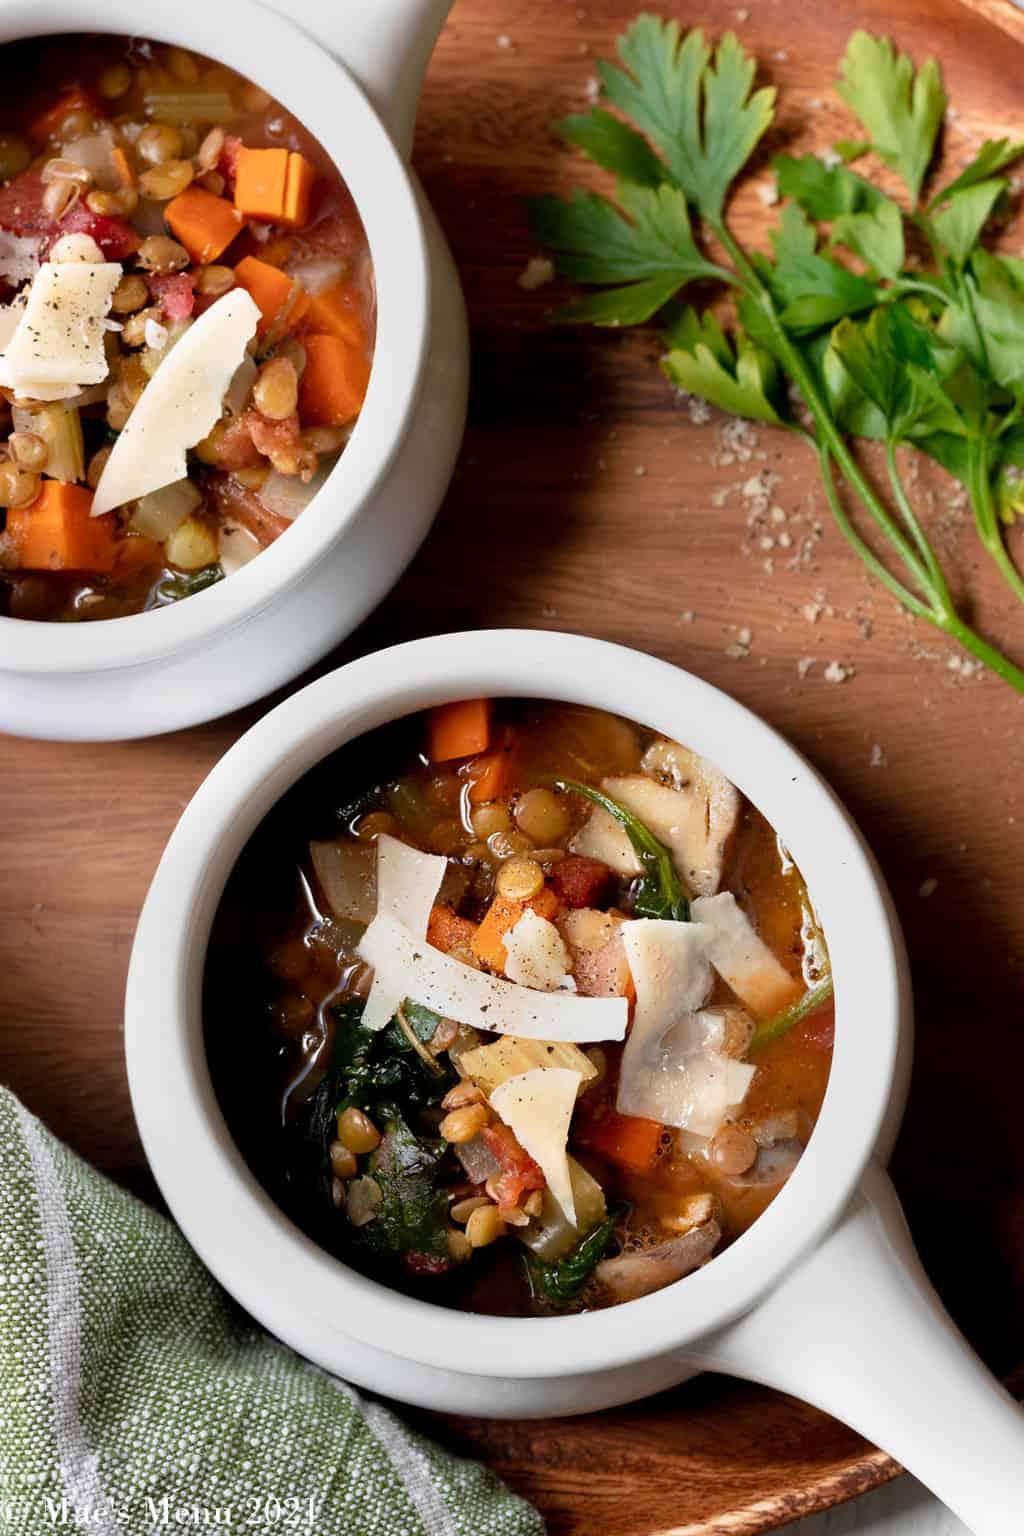 An overhead shot of wo bowls of Italian lentil soup